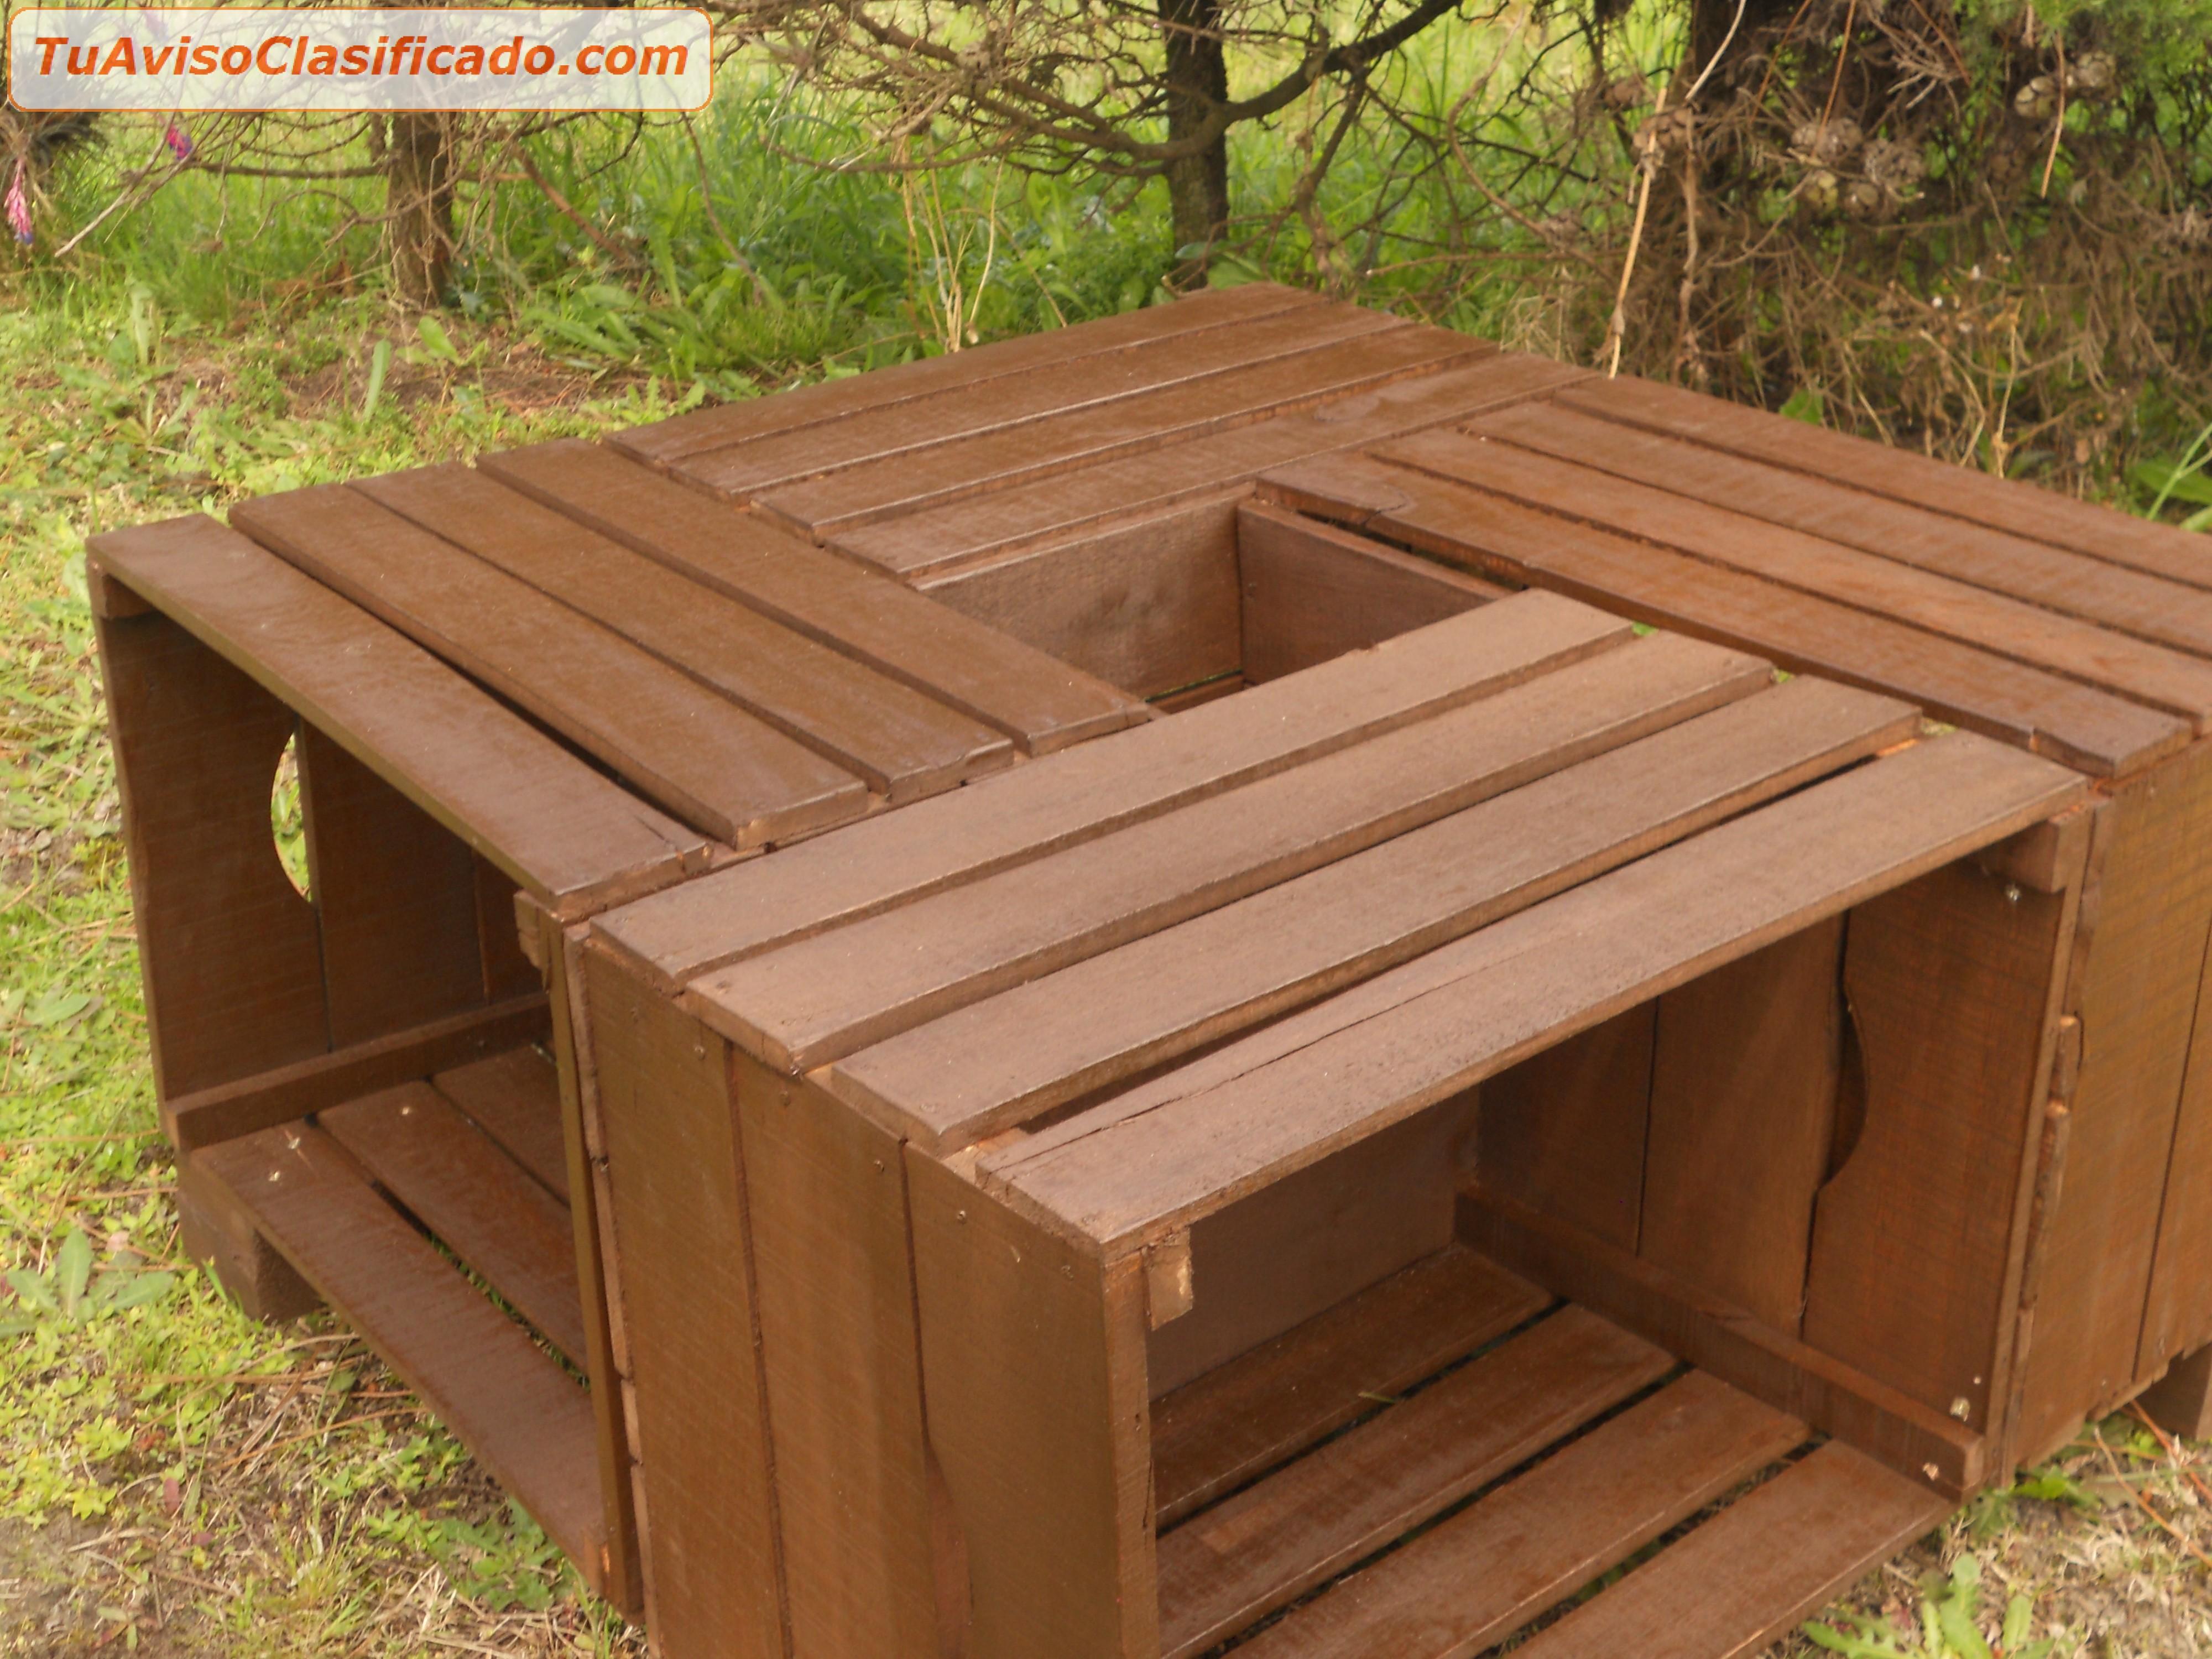 Muebles de pallets honduras 20170807215054 for Muebles de jardin uruguay